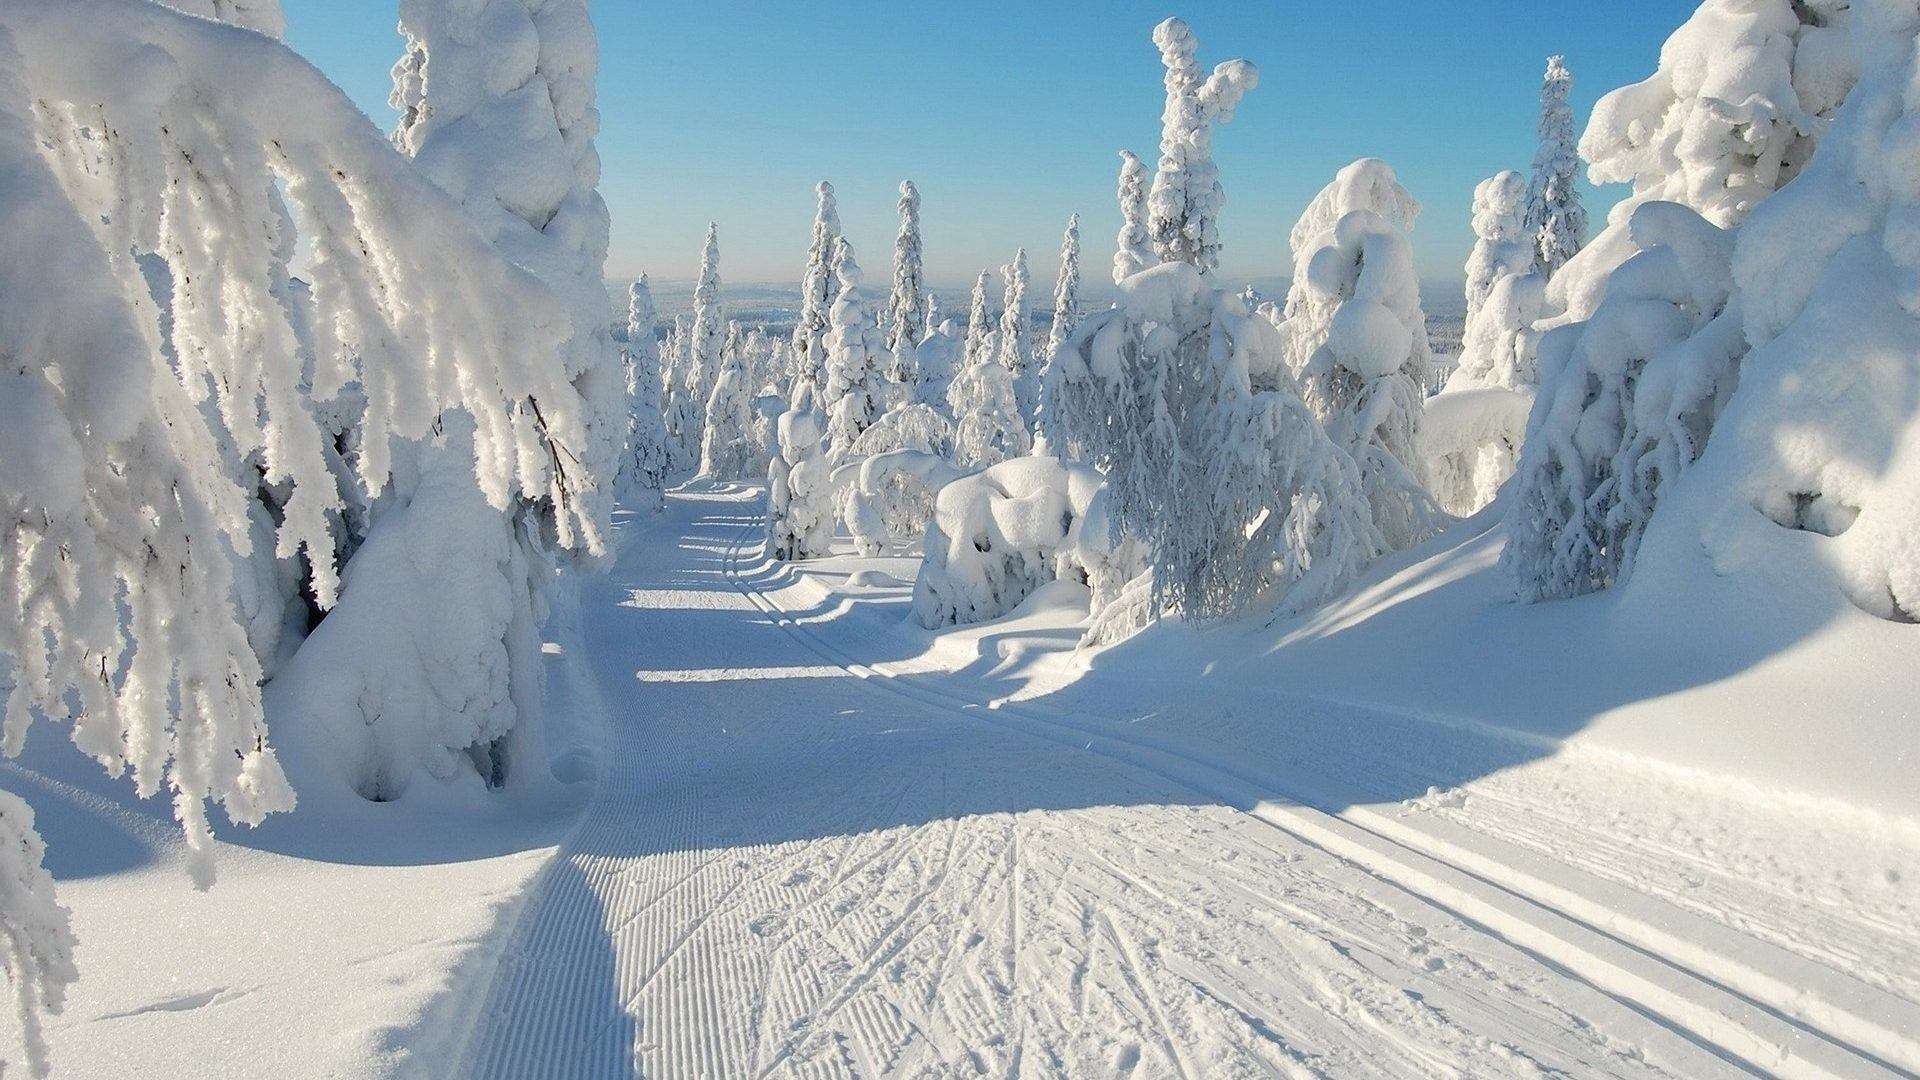 Snowy Night Wallpaper Download   Winter Snow Scene 985268 1920x1080